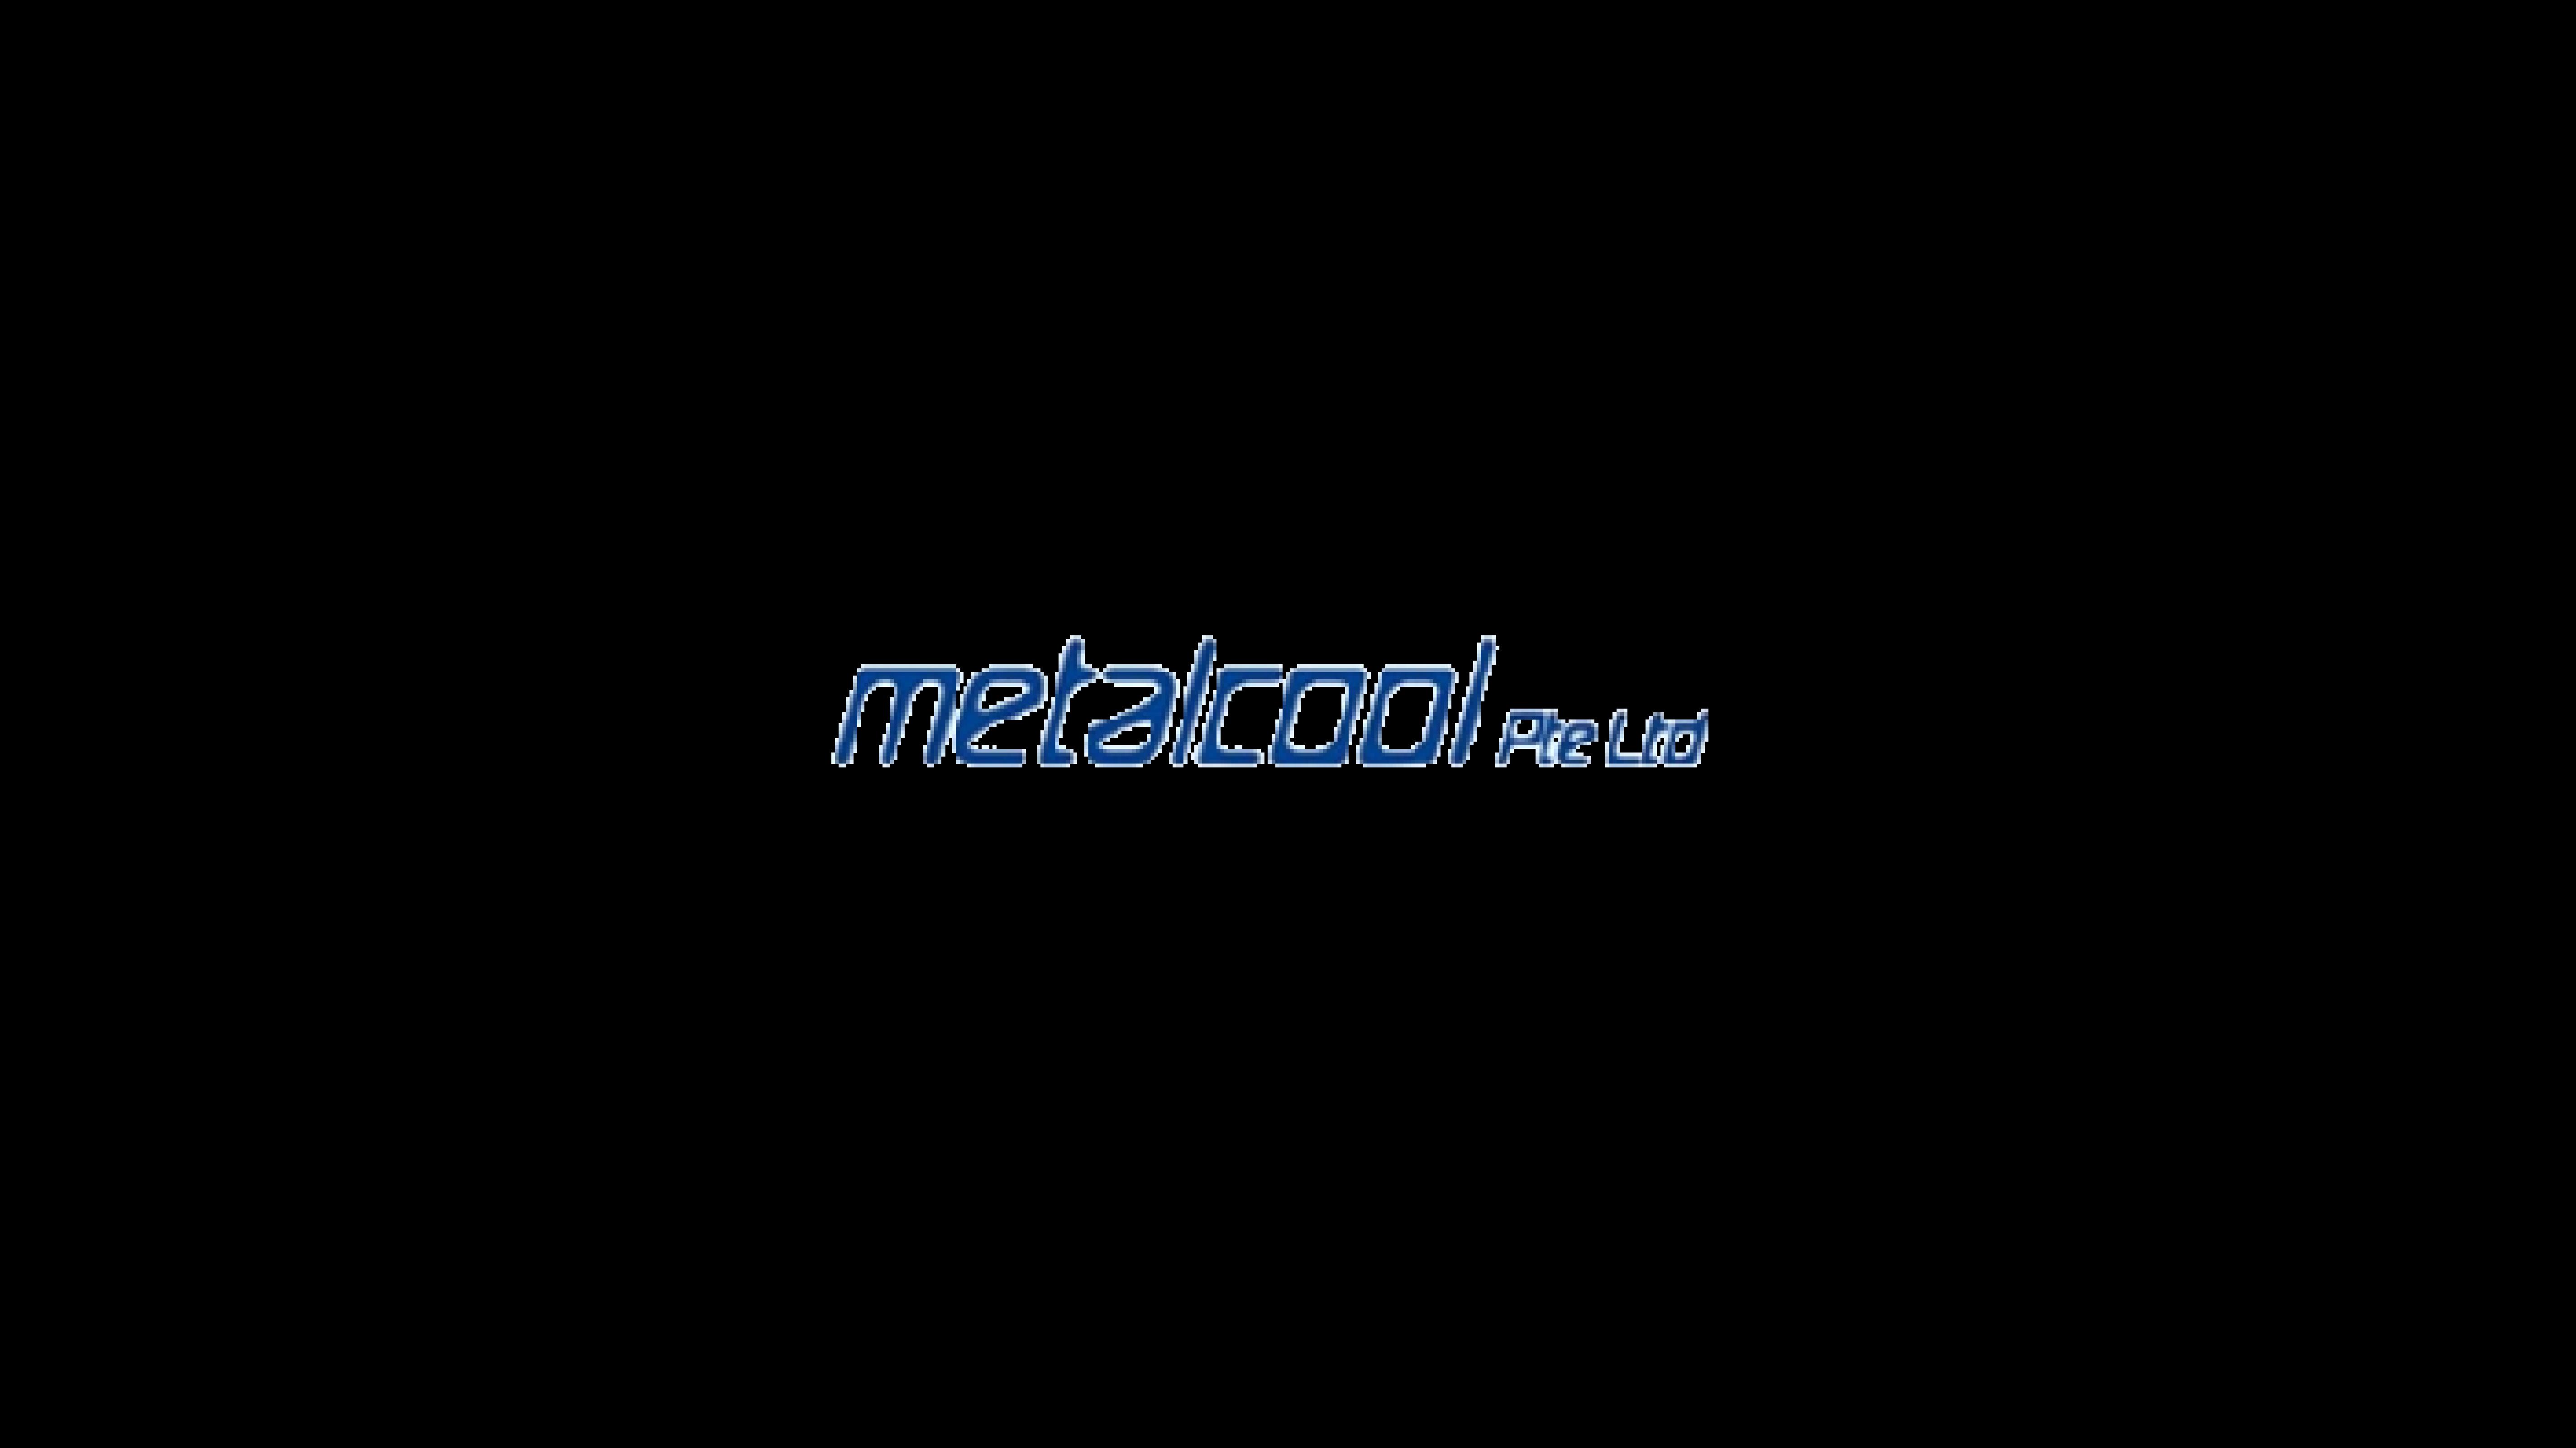 Metalcool